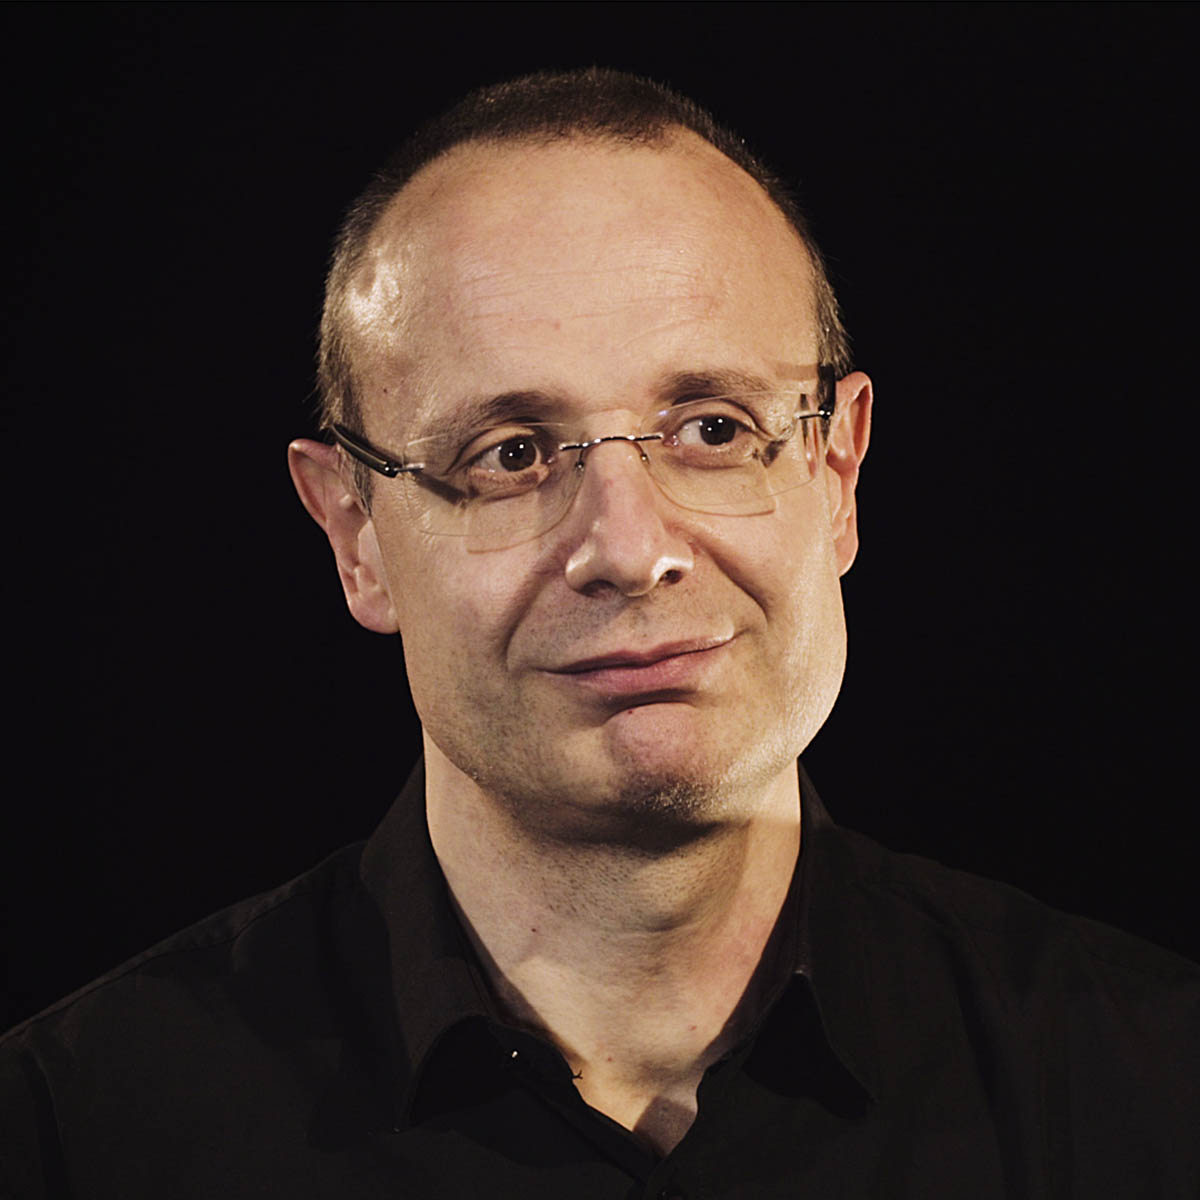 Sandro Acinapura